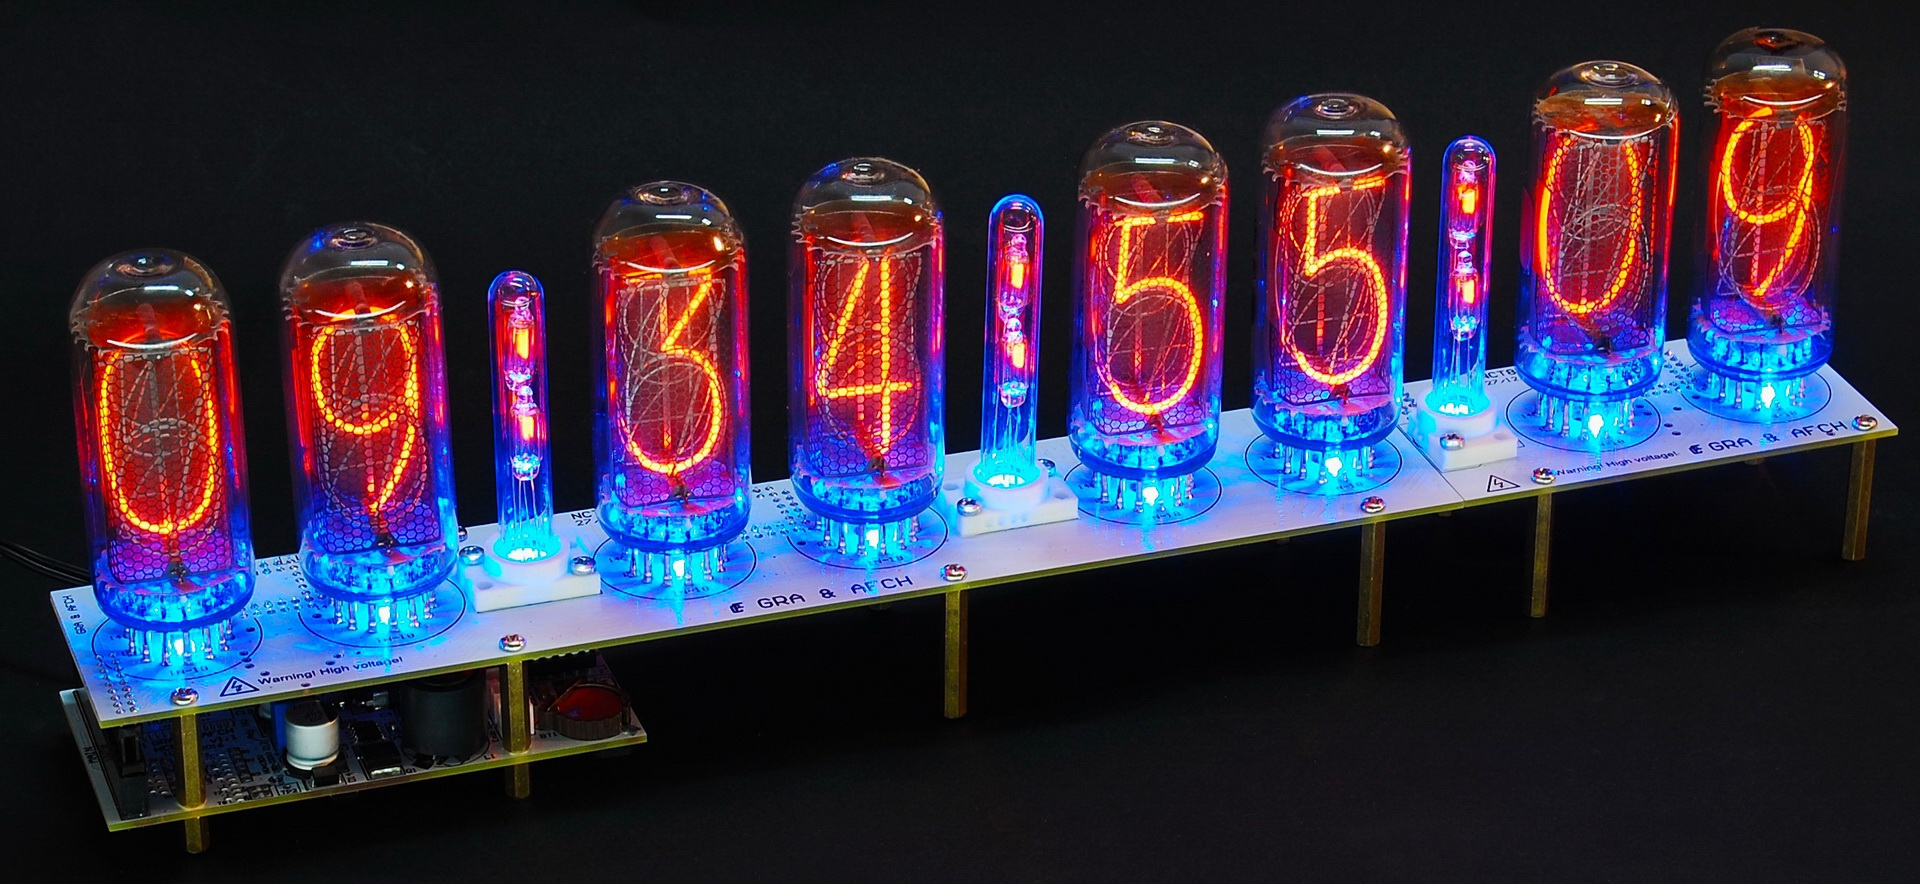 PCB Nixie tubes clock IN-18